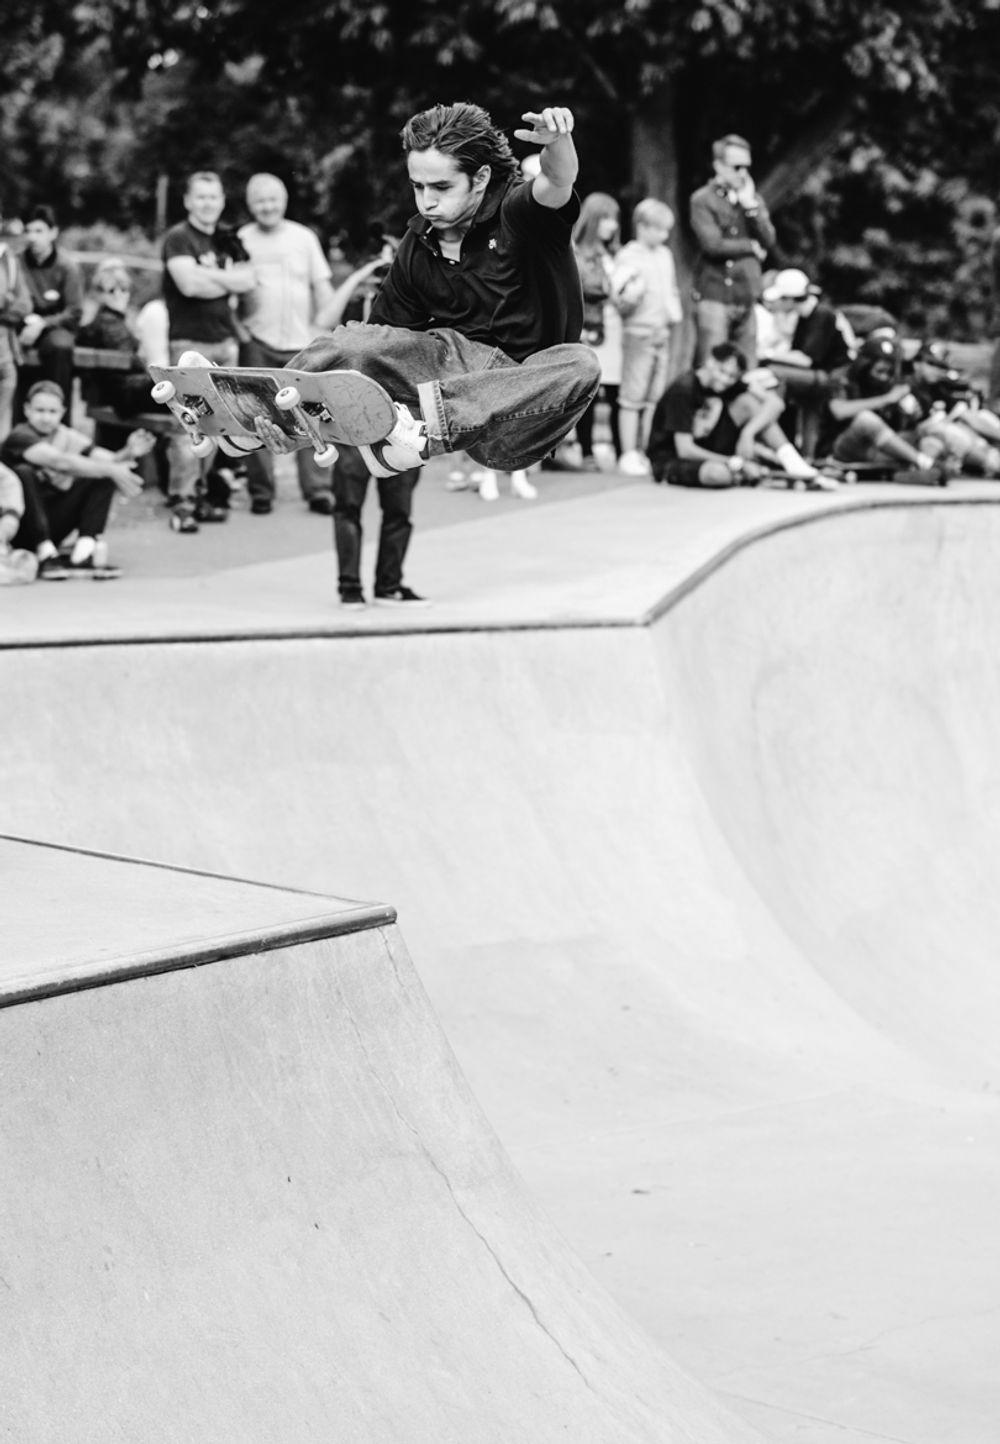 _IHC8089e-Donovon-Piscopo-Stalefish-Nike-SB-x-Slam-City-Skates-Go-Skateboarding-Day-London-June-2015-Photographer-Maksim-Kalanep